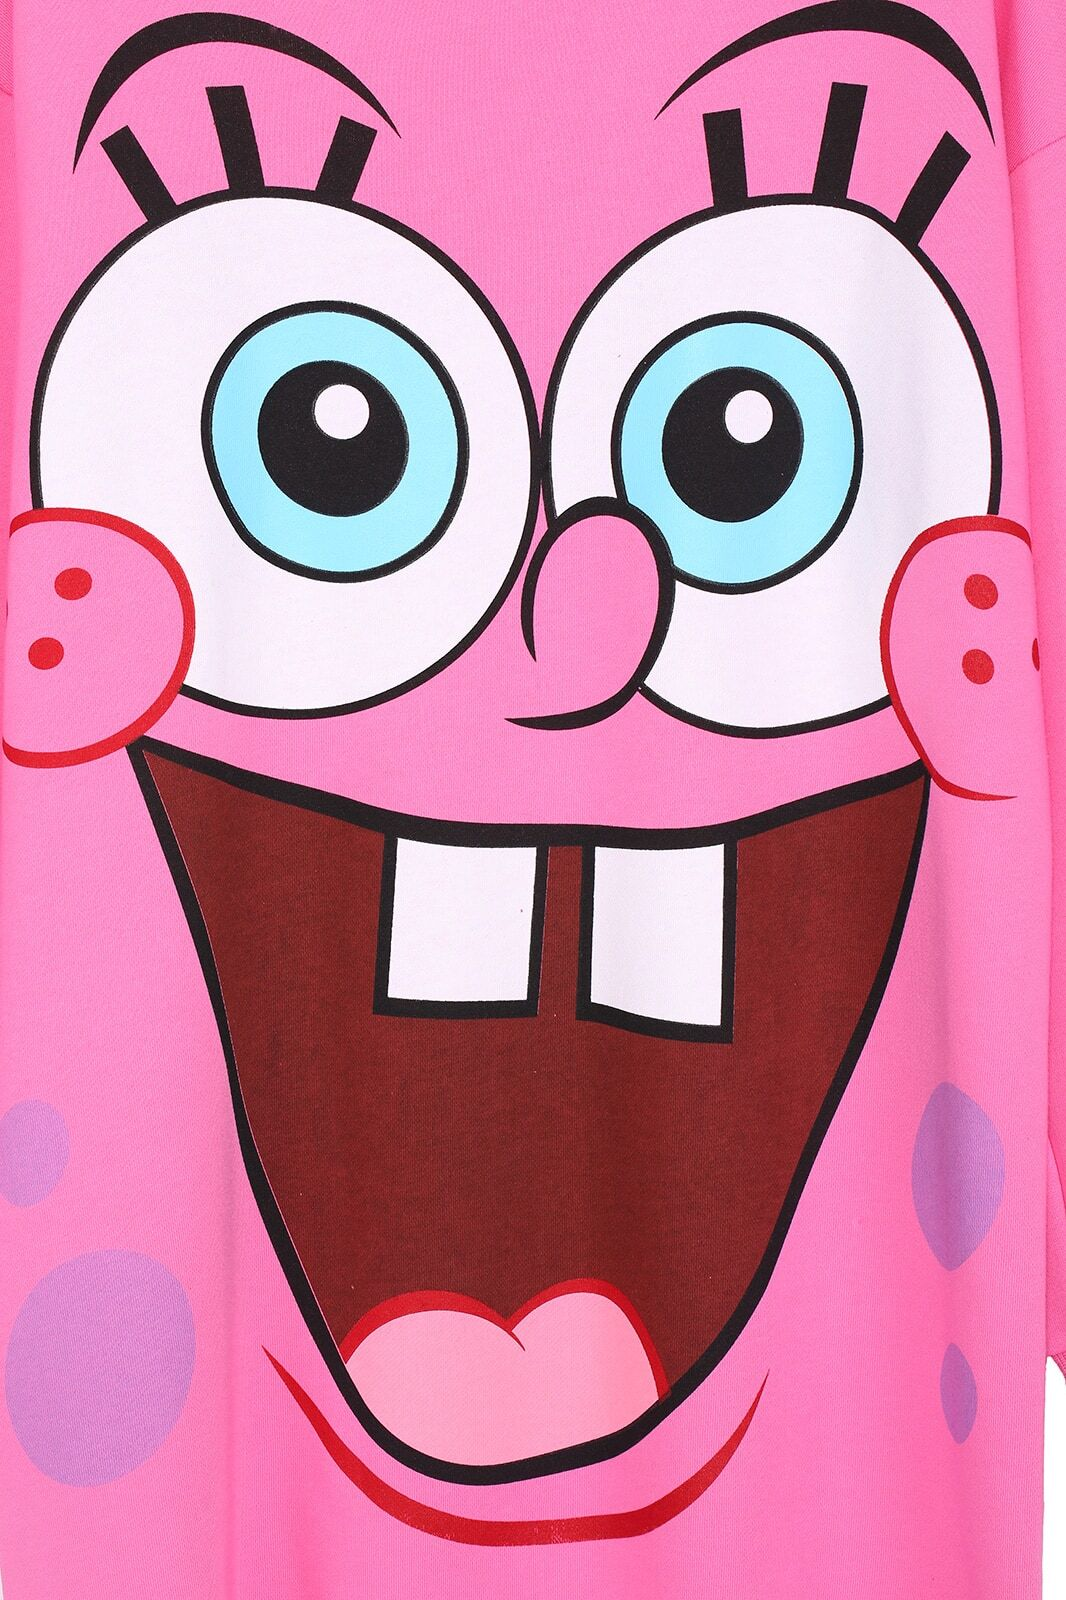 Cartoon Spongebob Print Pink Sweatshirtfor Women Romwe